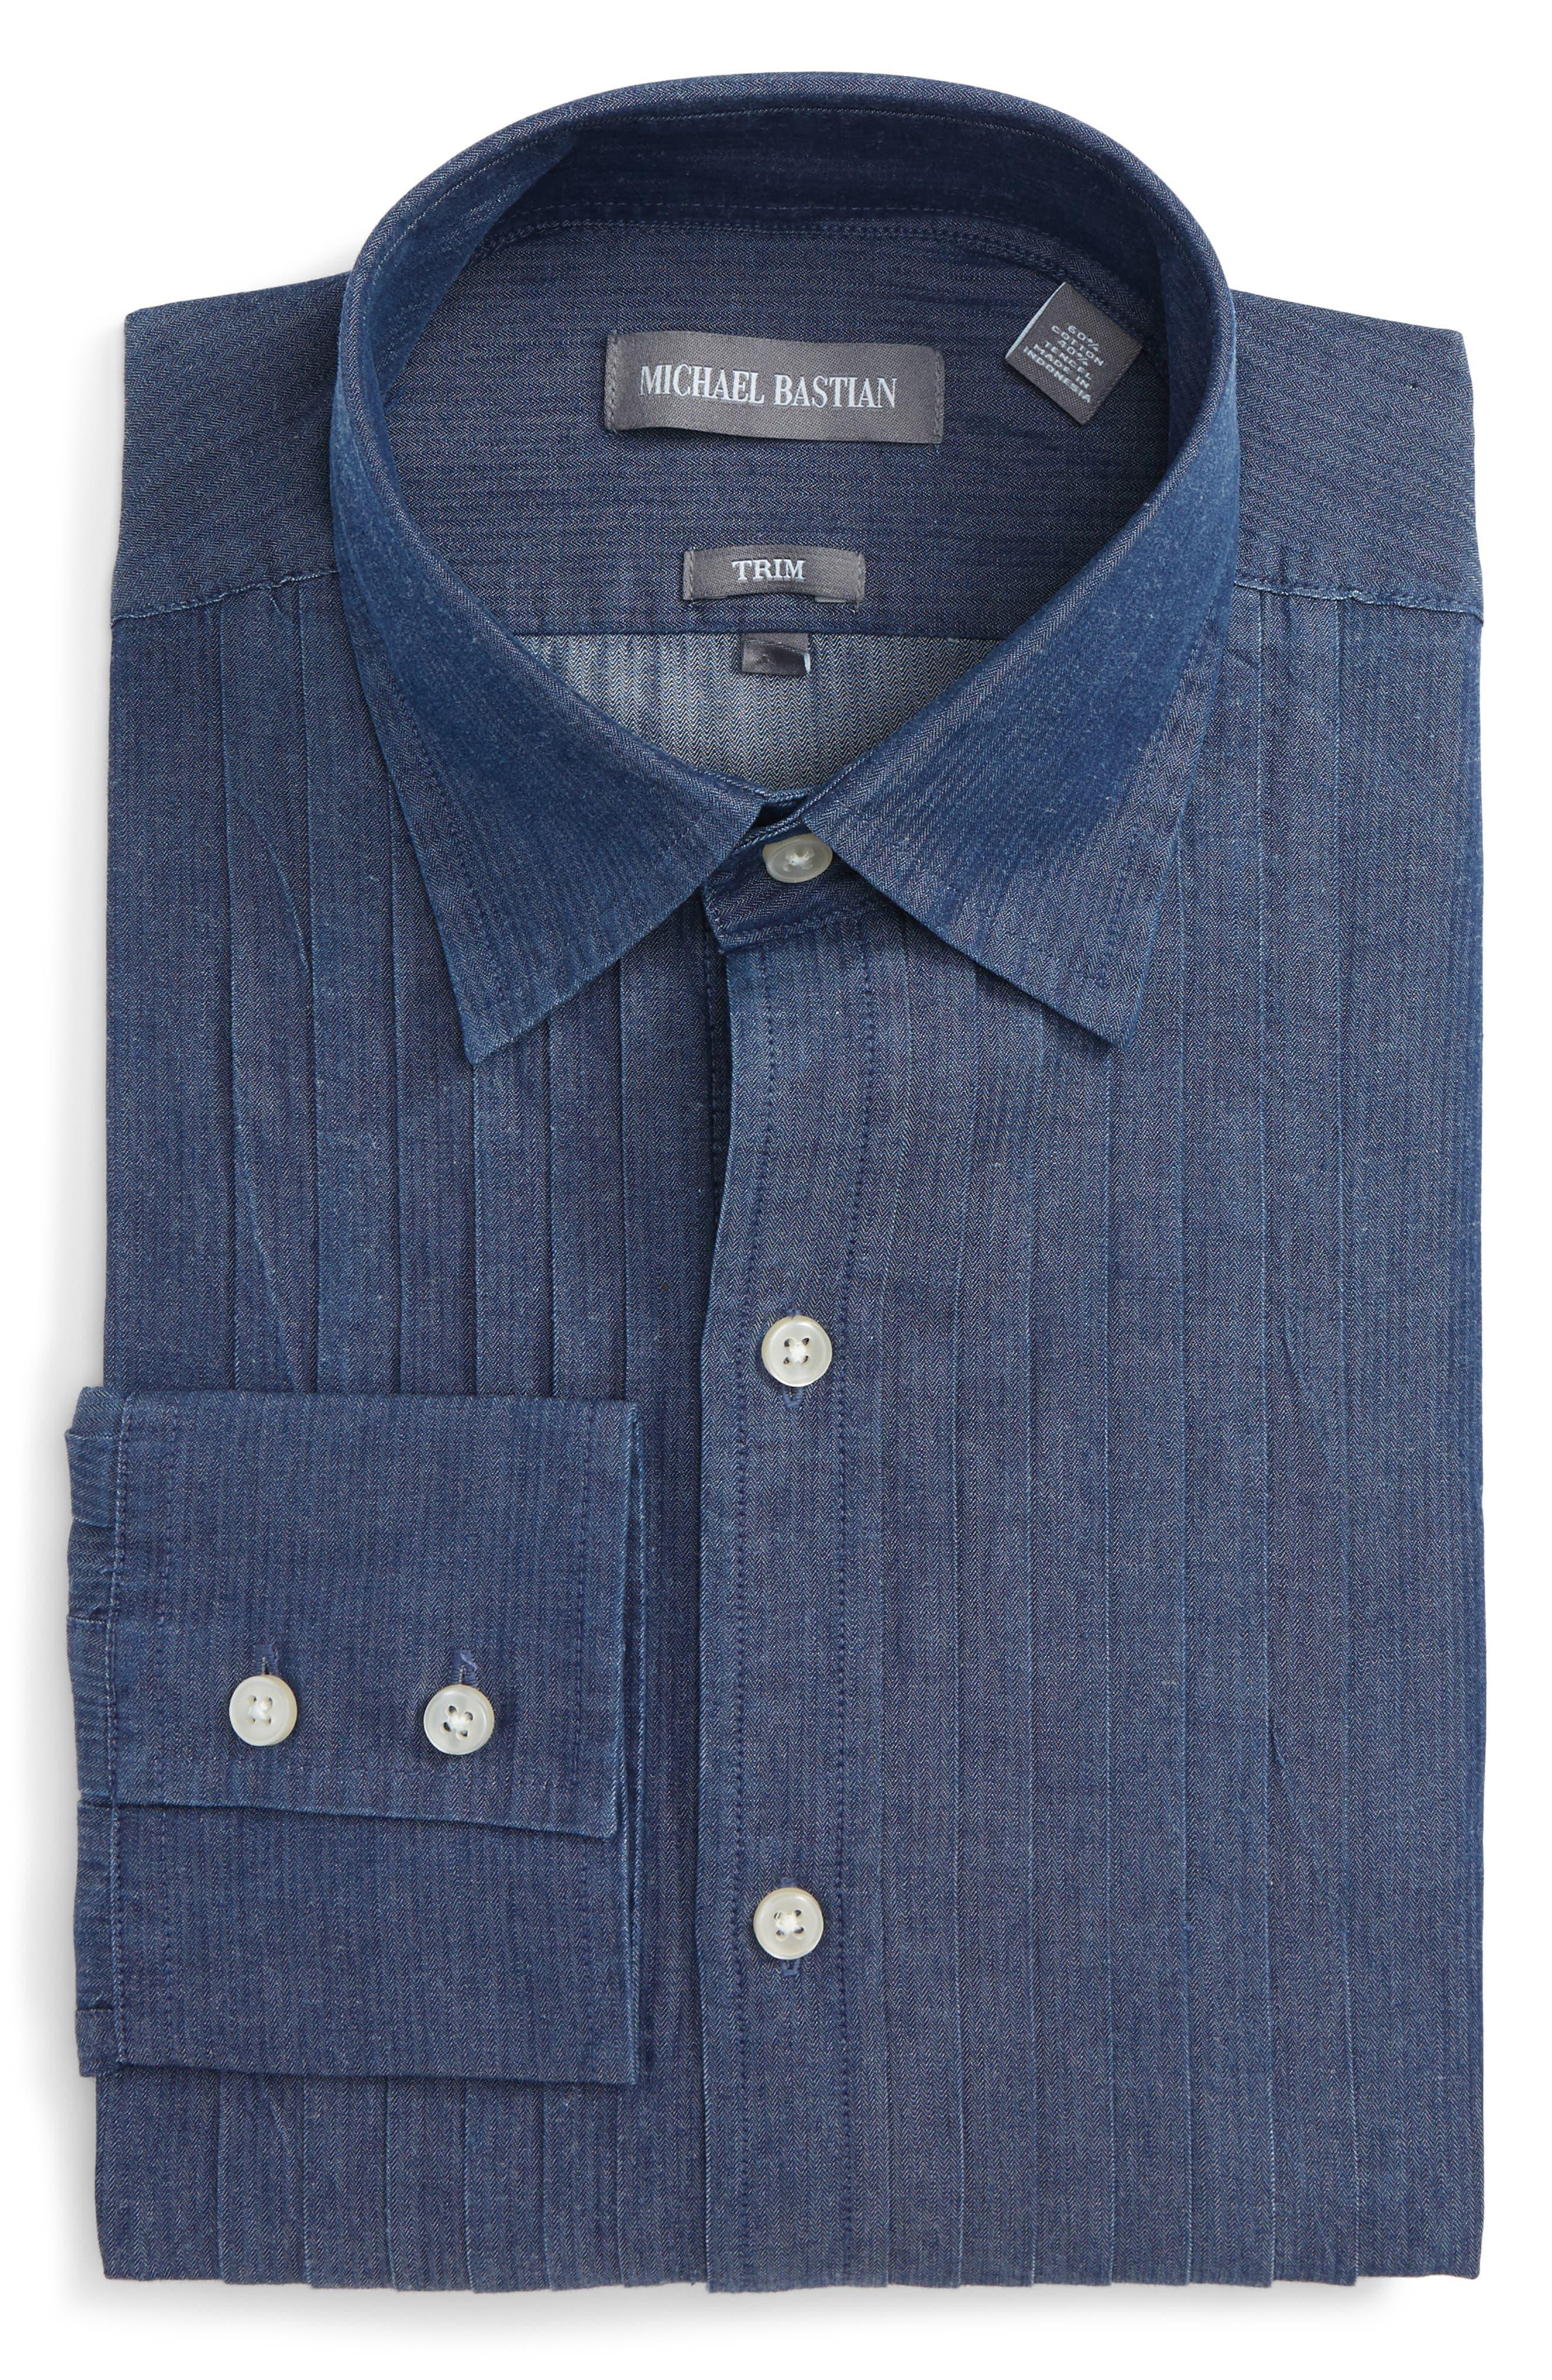 Trim Fit Denim Dress Shirt,                             Main thumbnail 1, color,                             402